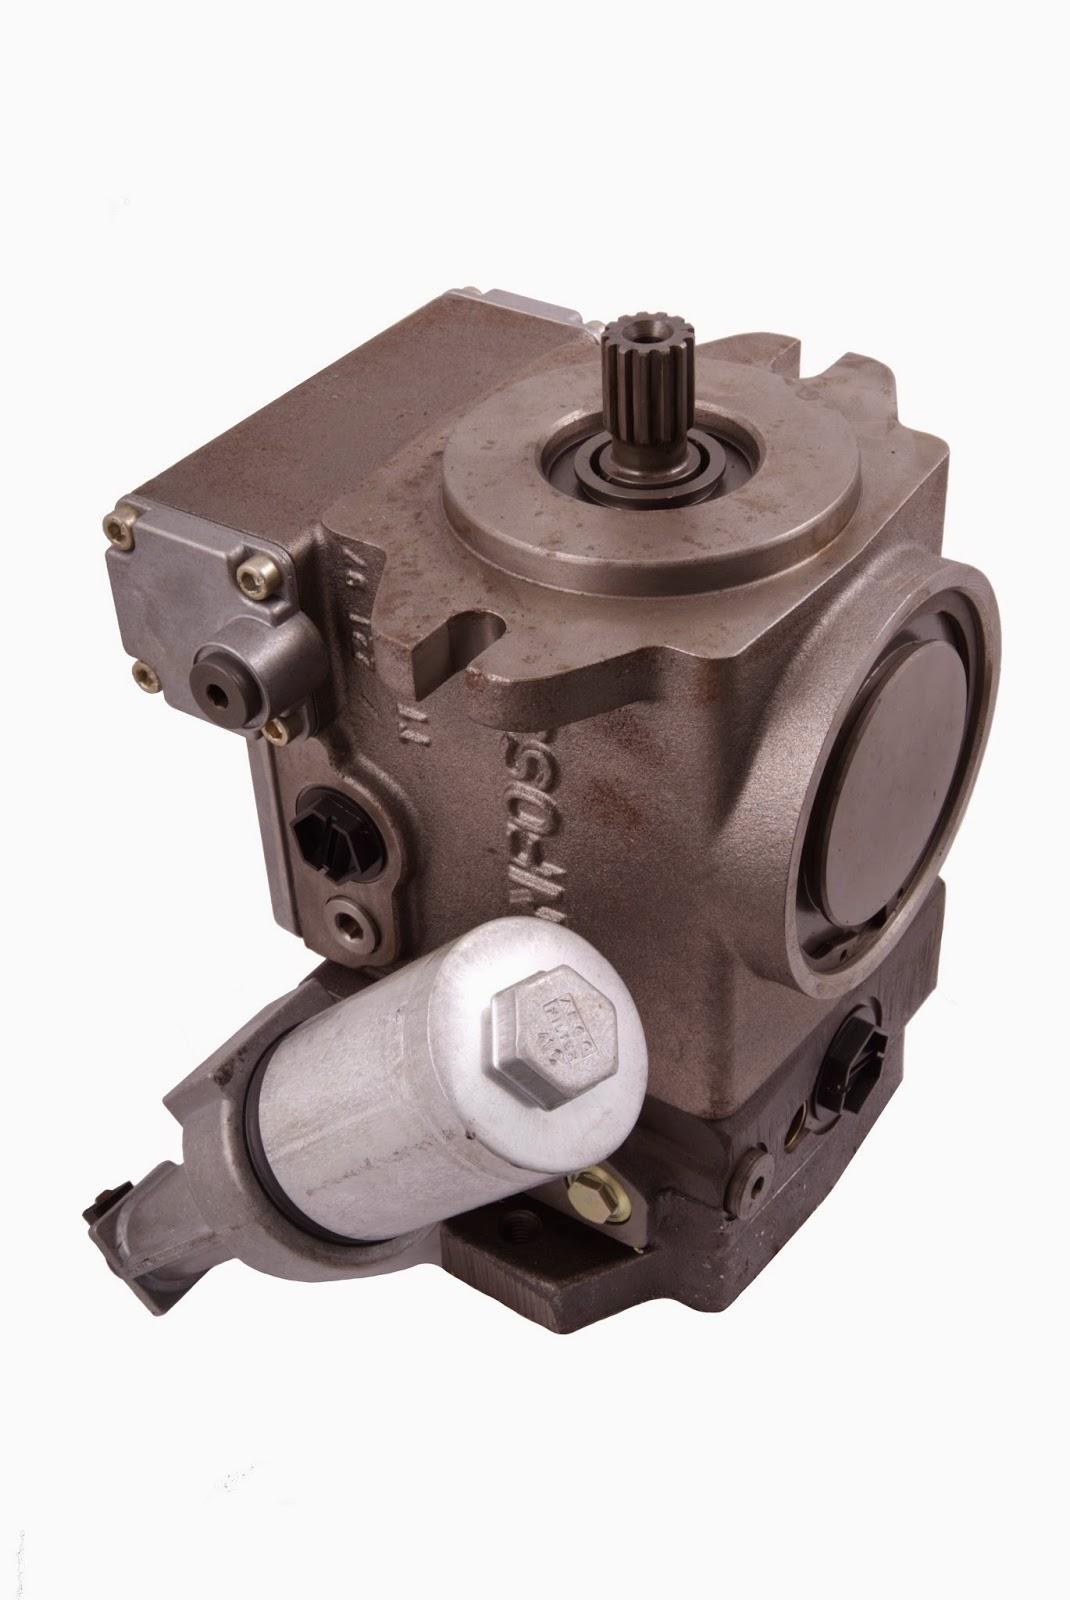 Turf Maintenance Hydraulics by P&R Hydraulics Ltd: Danfoss